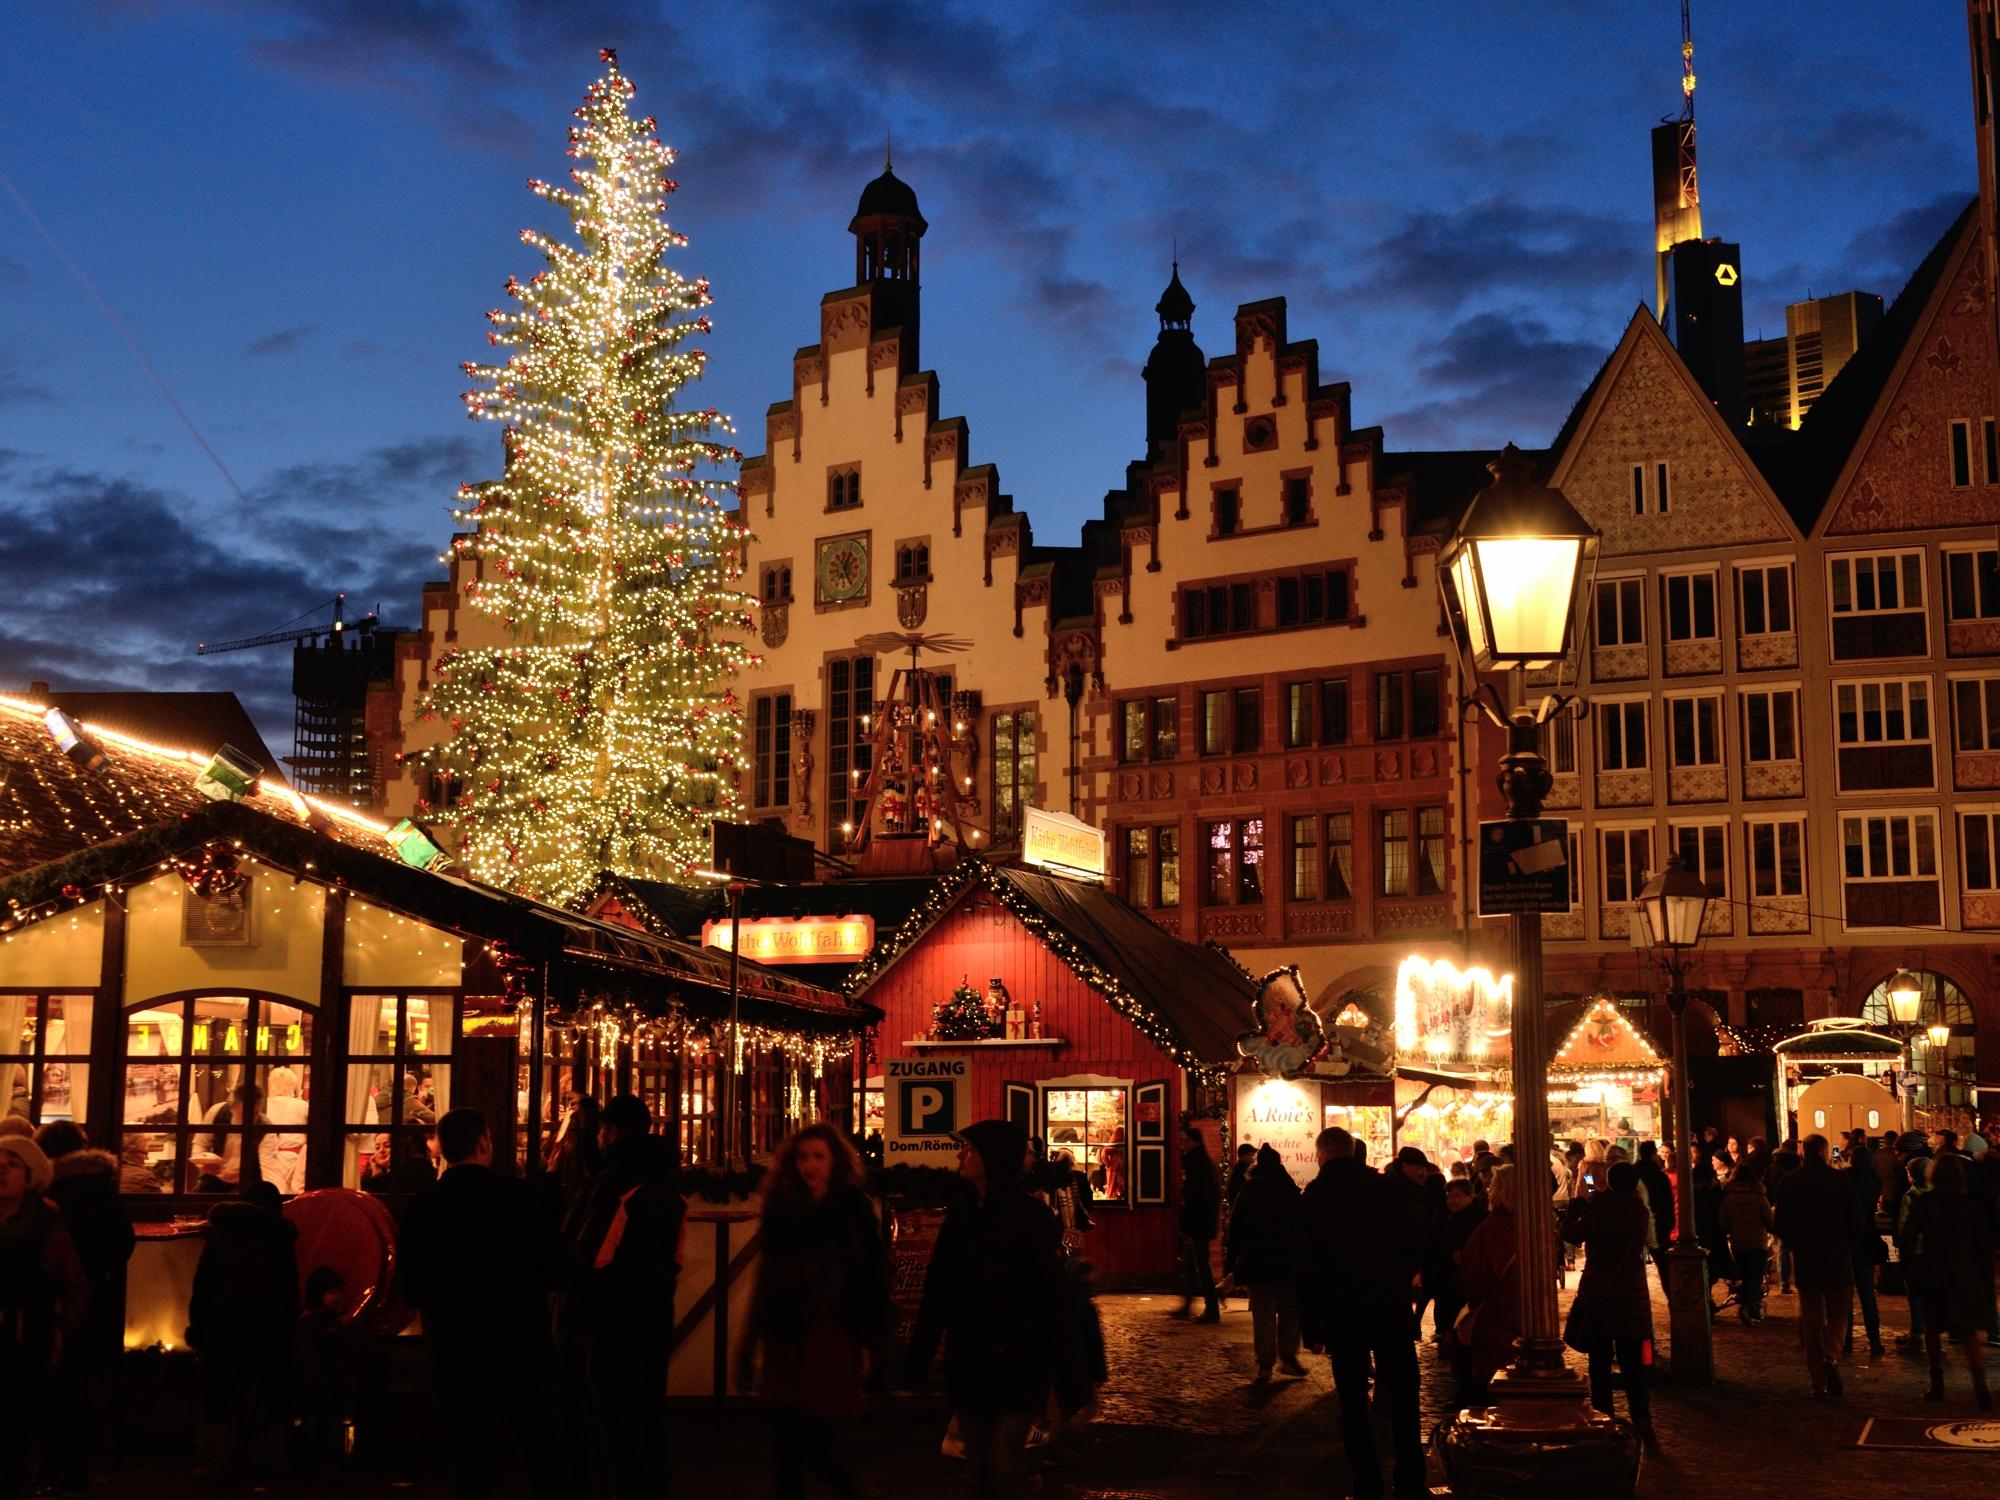 Frankfurt Römerberg - town hall and Christmas tree